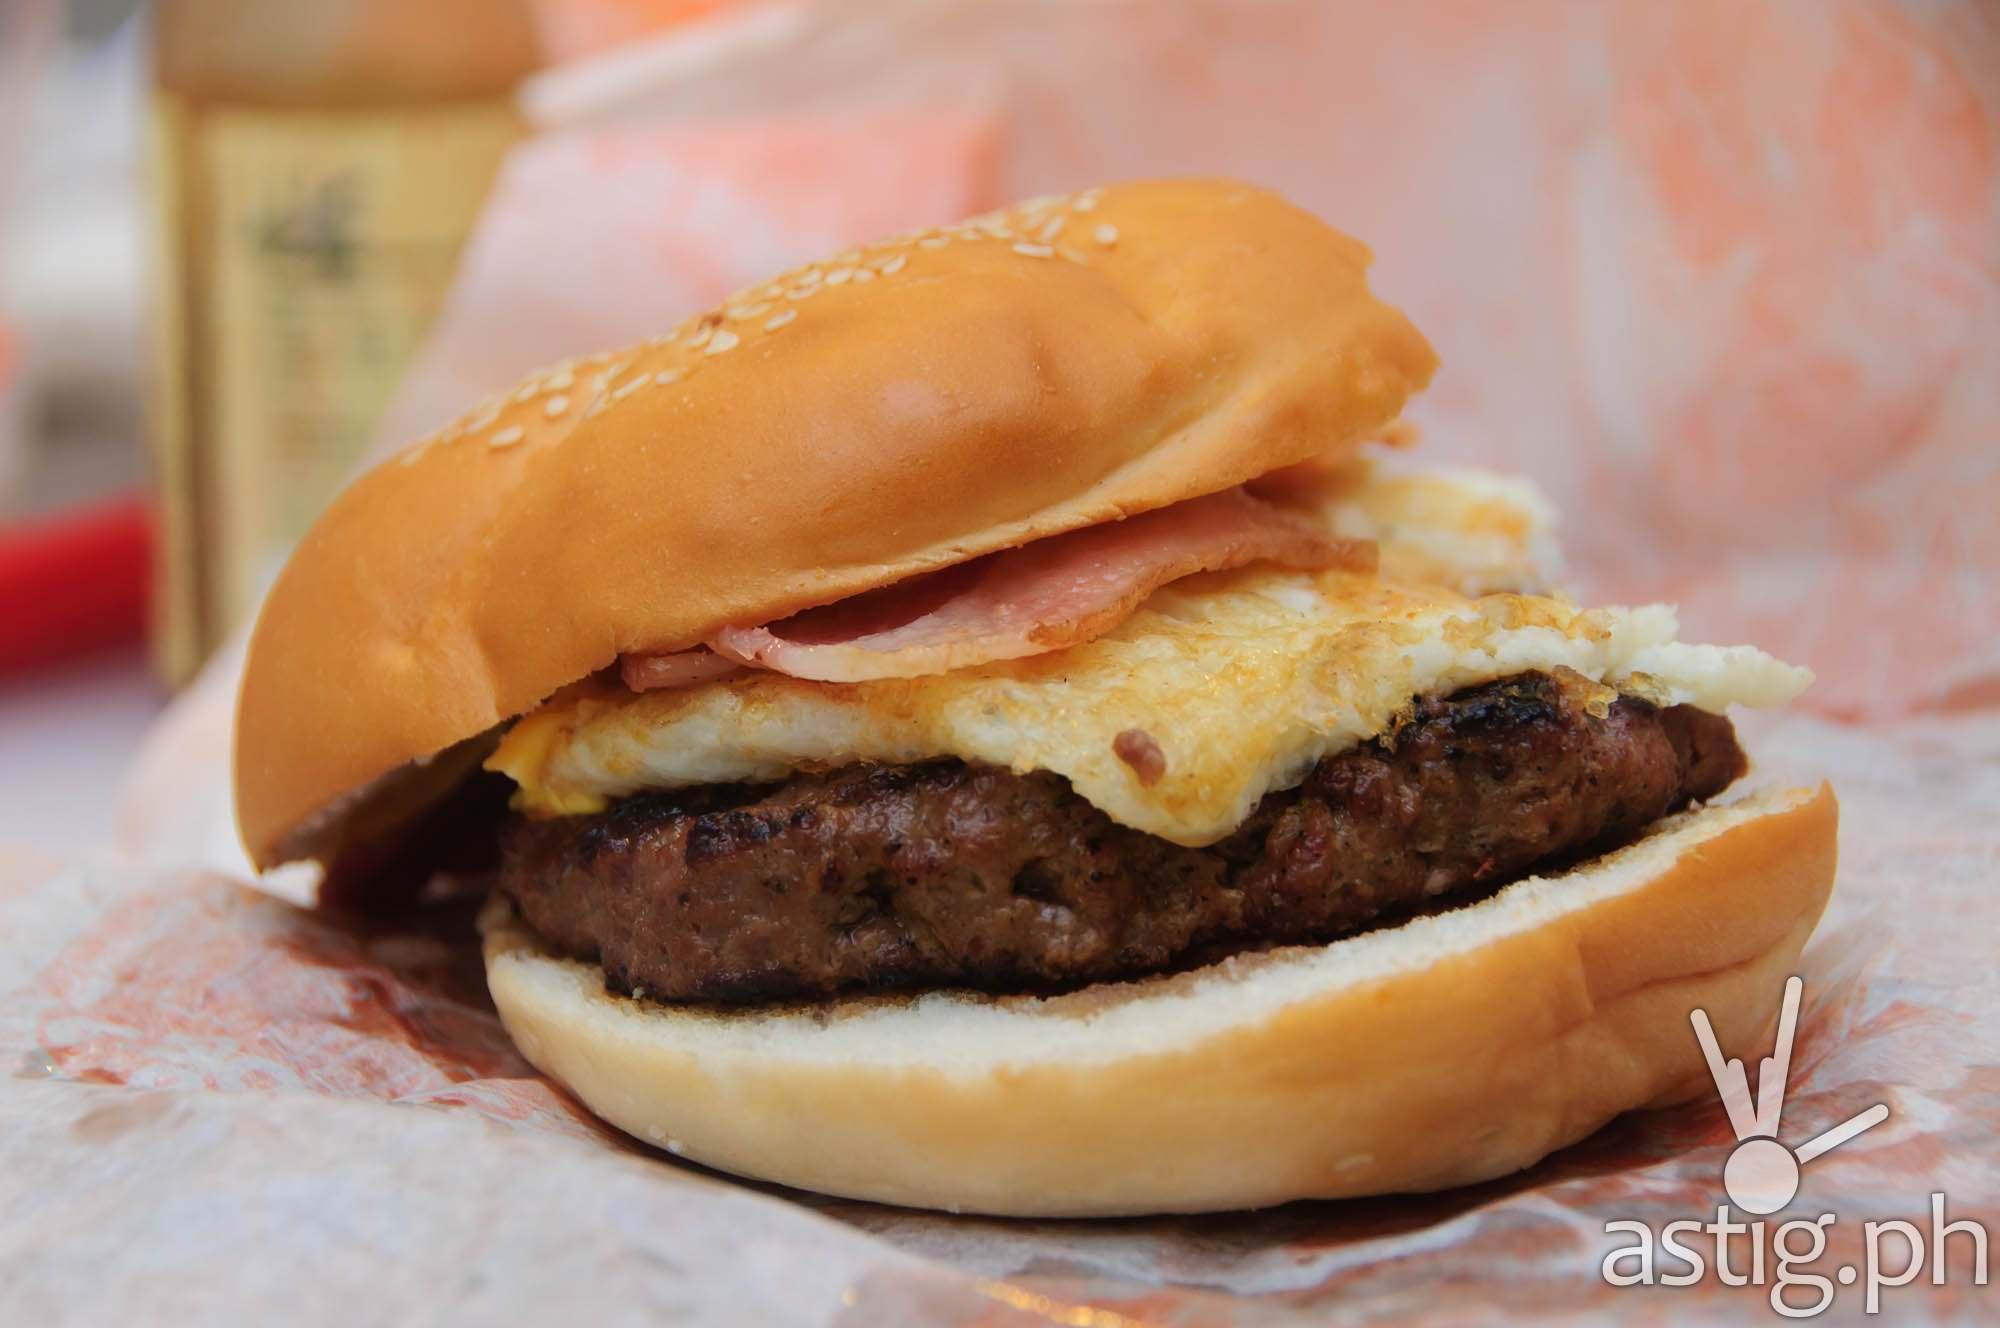 Brekkie Burger at Wham! Burgers